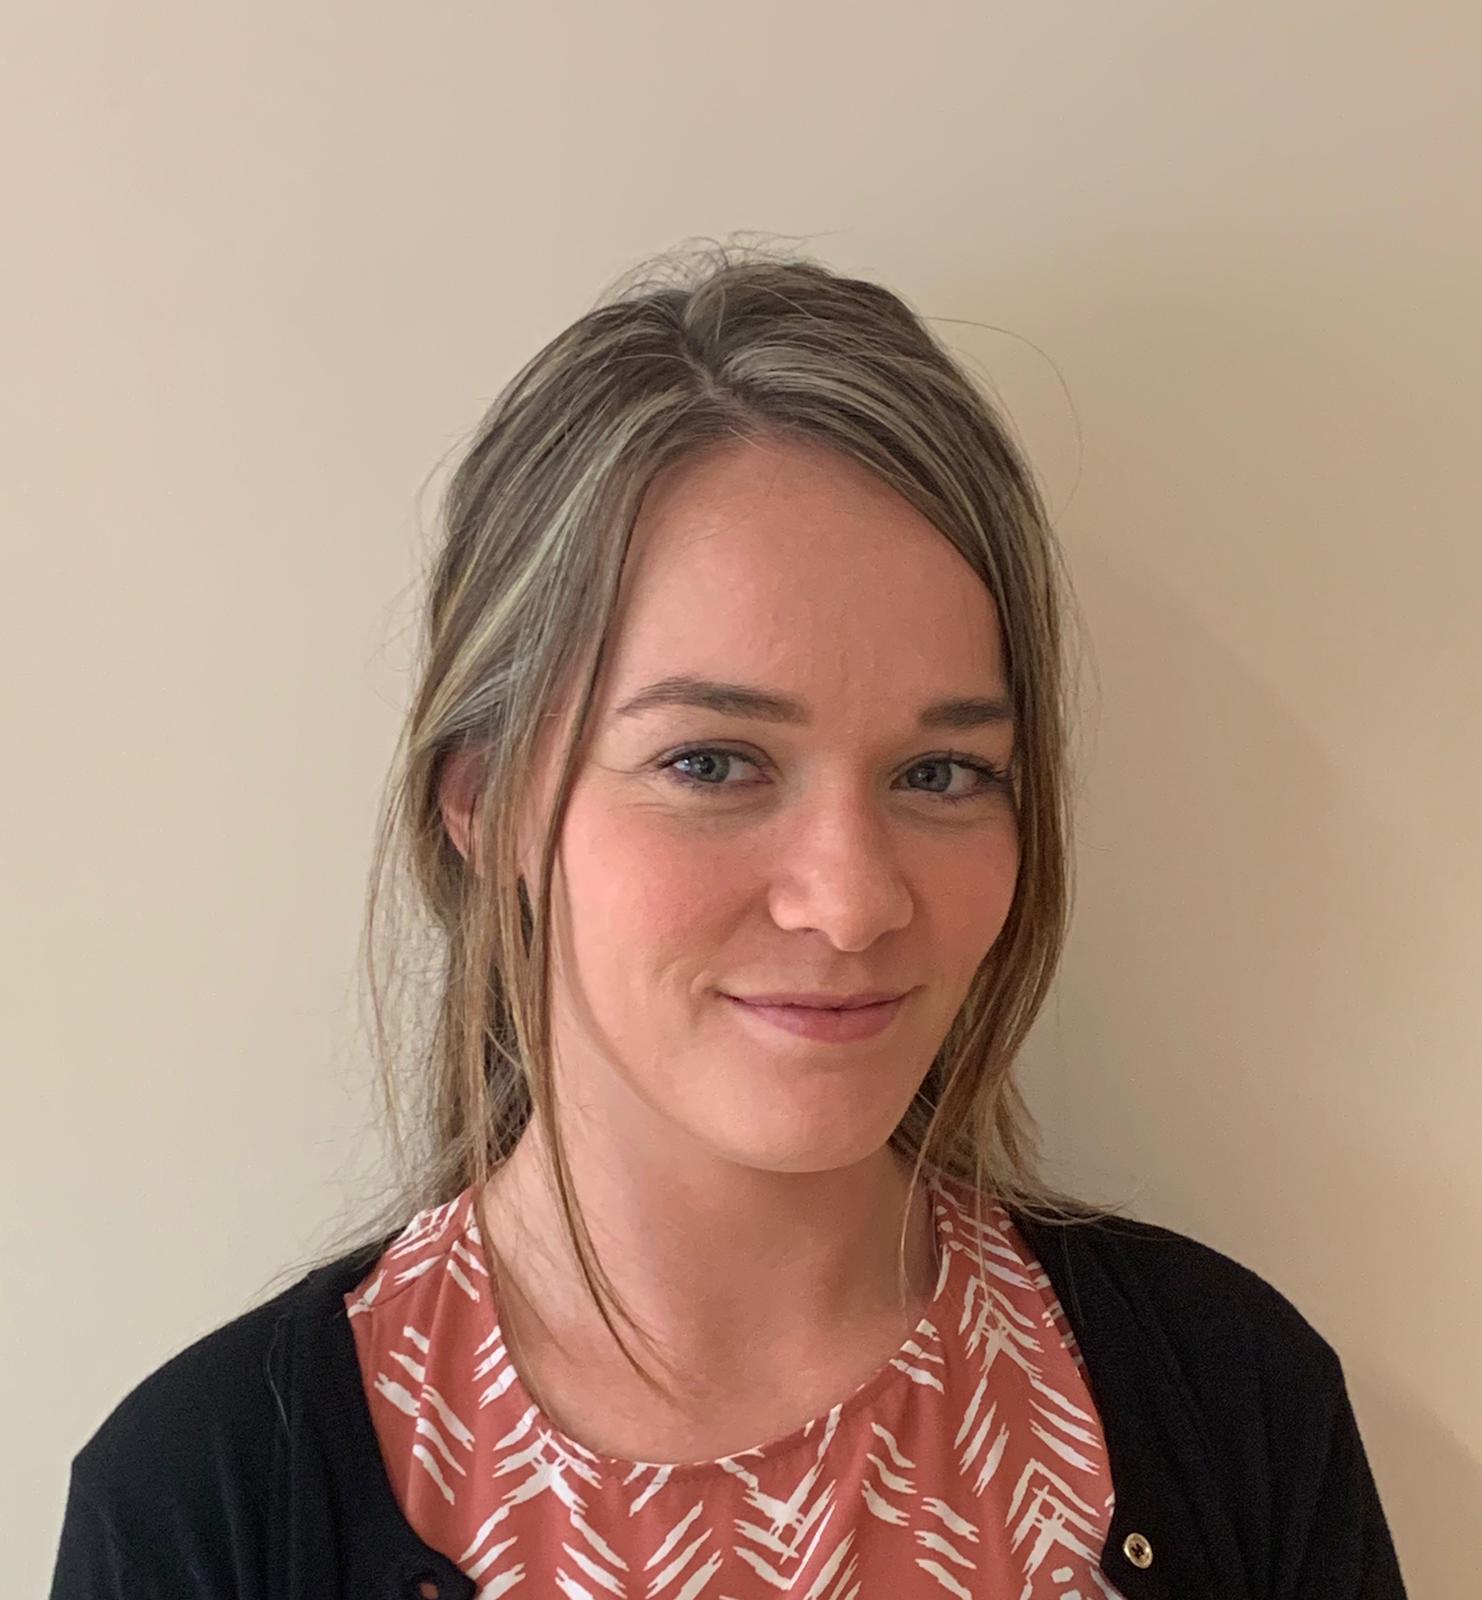 Rachel O' Regan